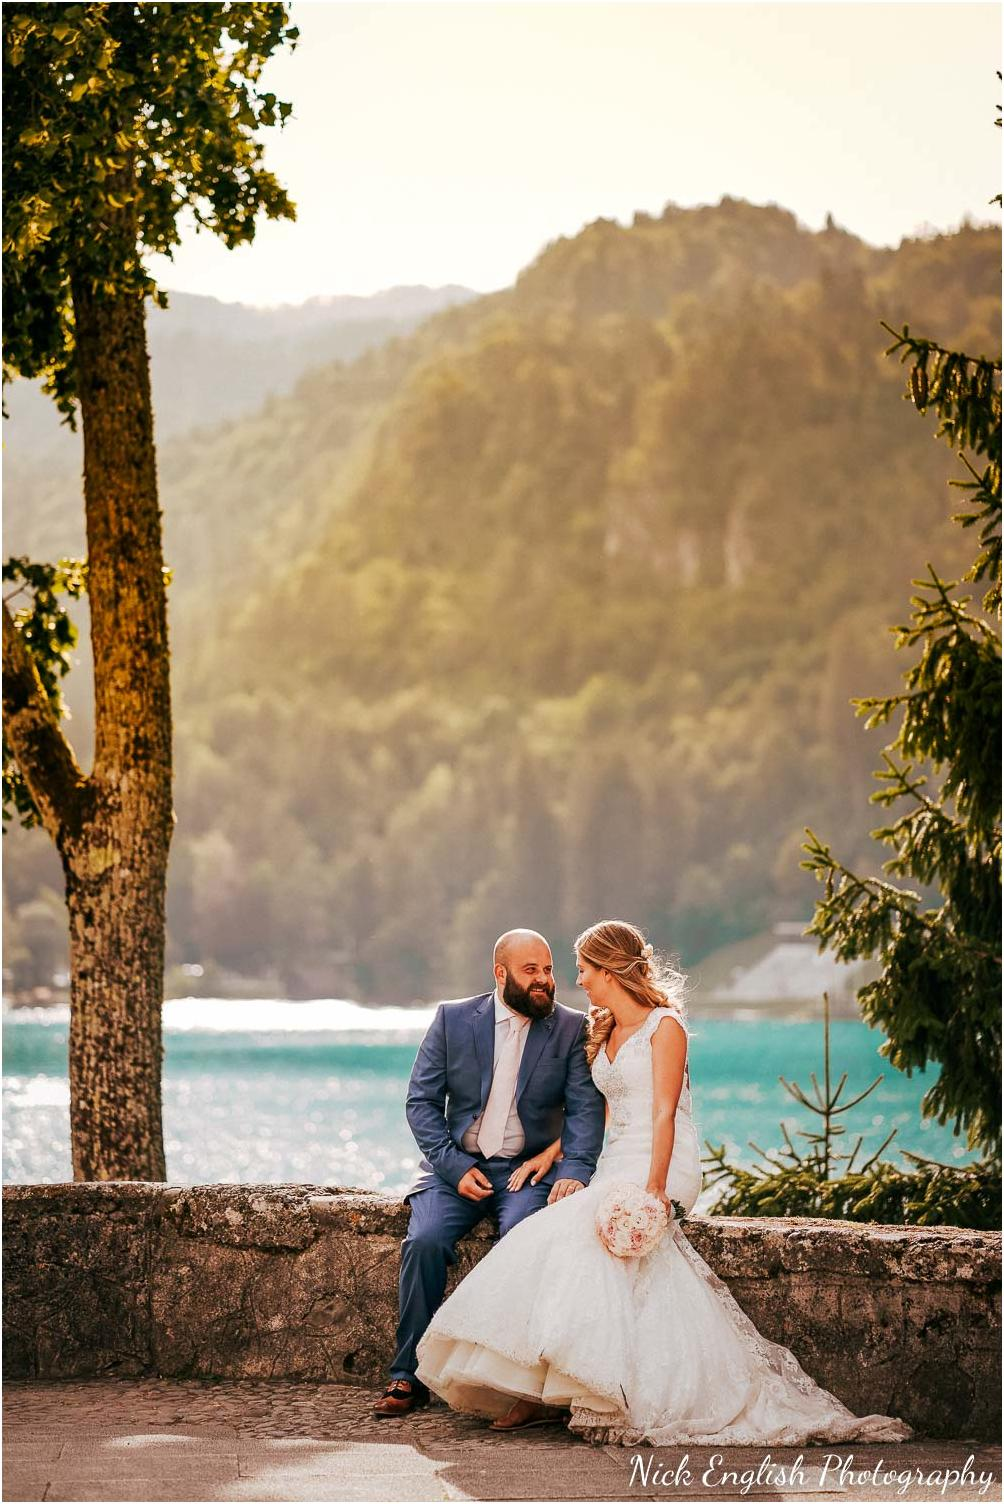 Destination_Wedding_Photographer_Slovenia_Nick_English_Photography-70-10.jpg